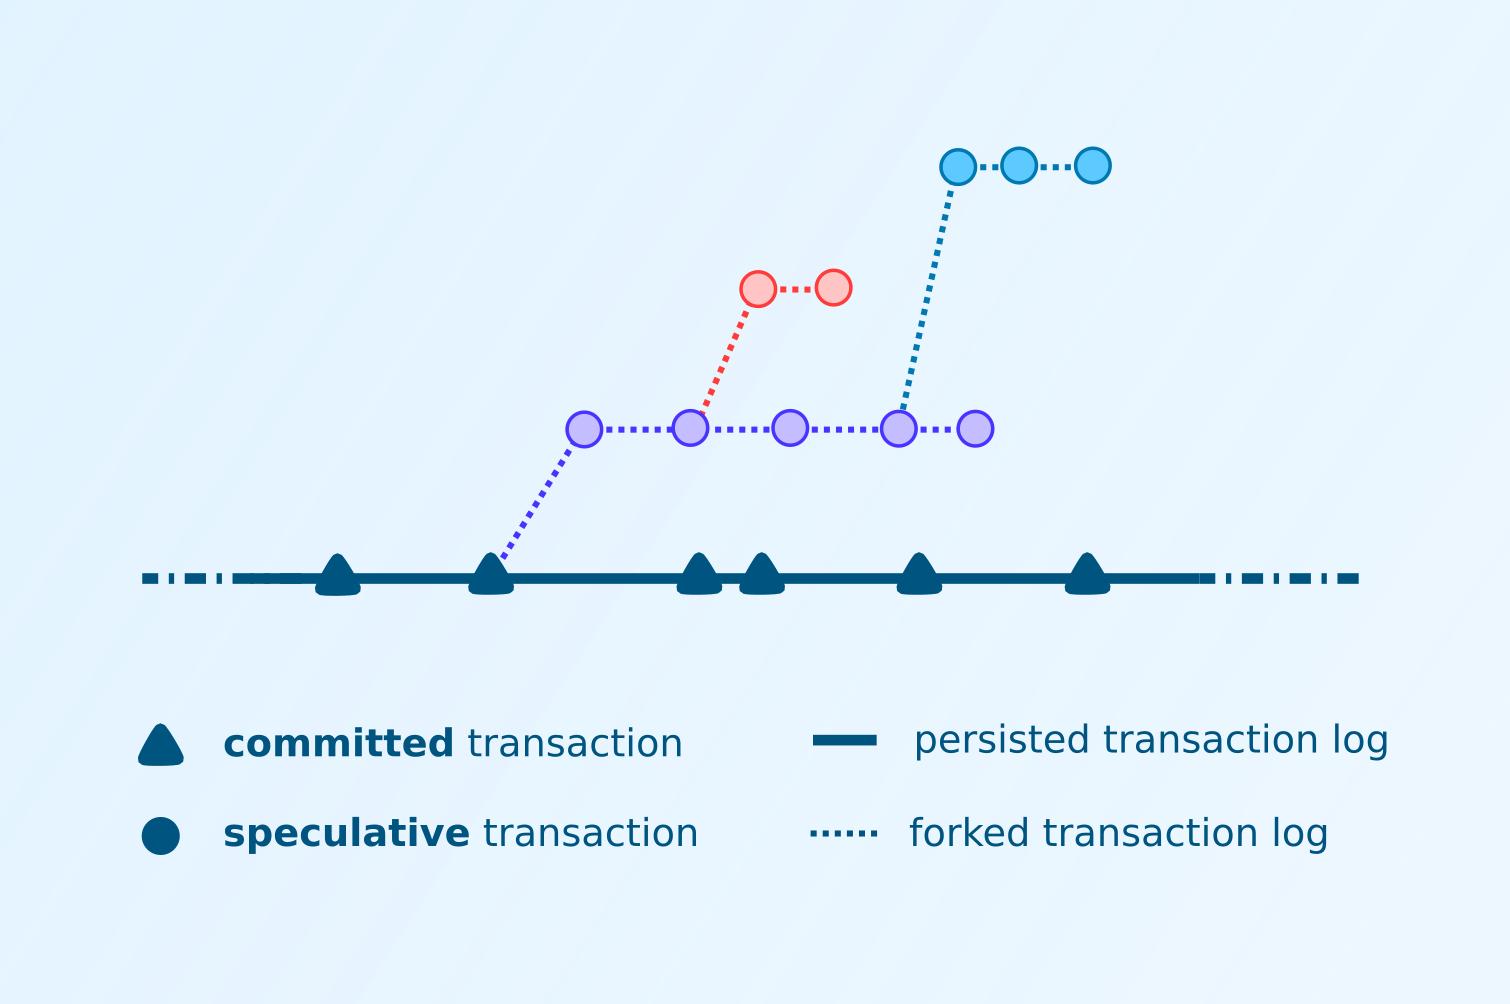 Spectulative transactions